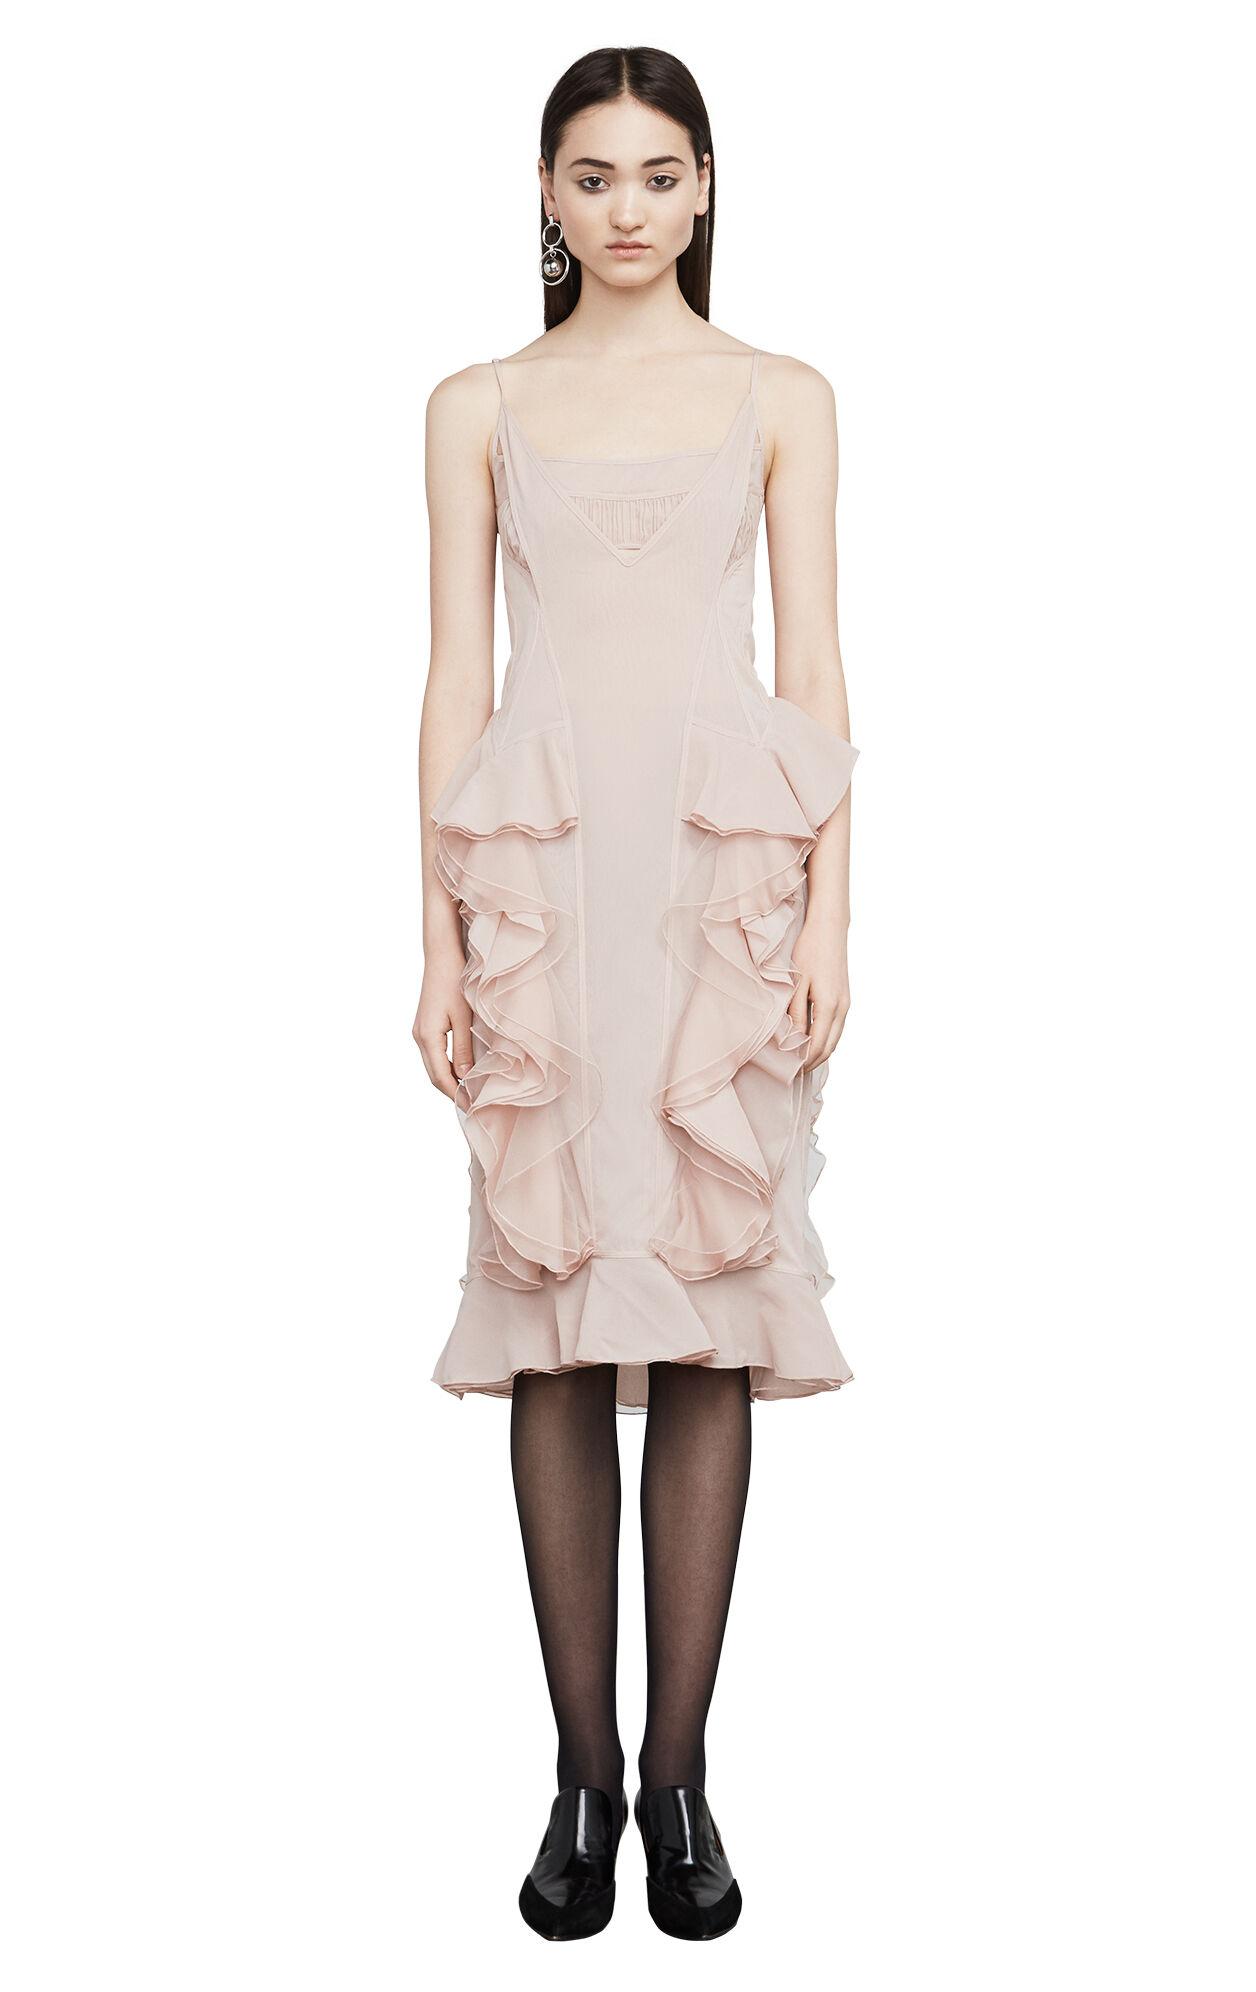 Anais Ruffled Sheer Chiffon Slip Dress